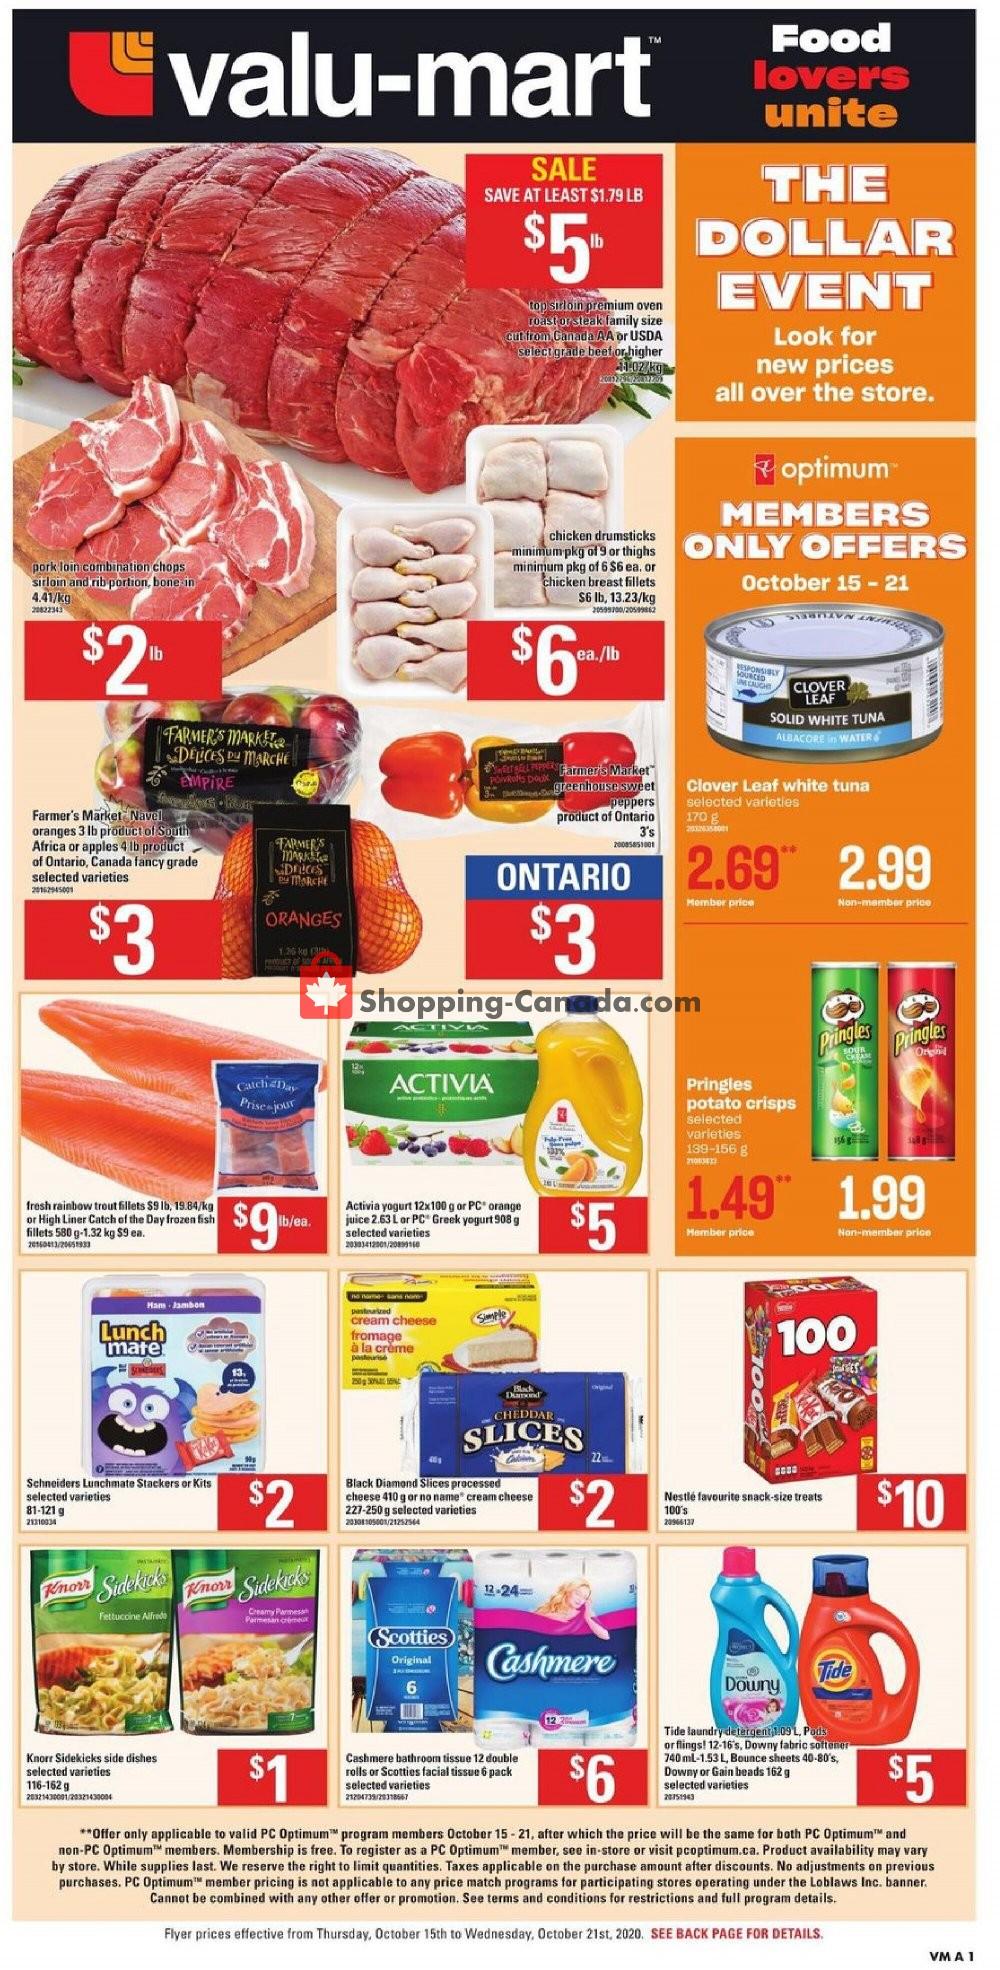 Flyer Valu Mart Canada - from Thursday October 15, 2020 to Wednesday October 21, 2020